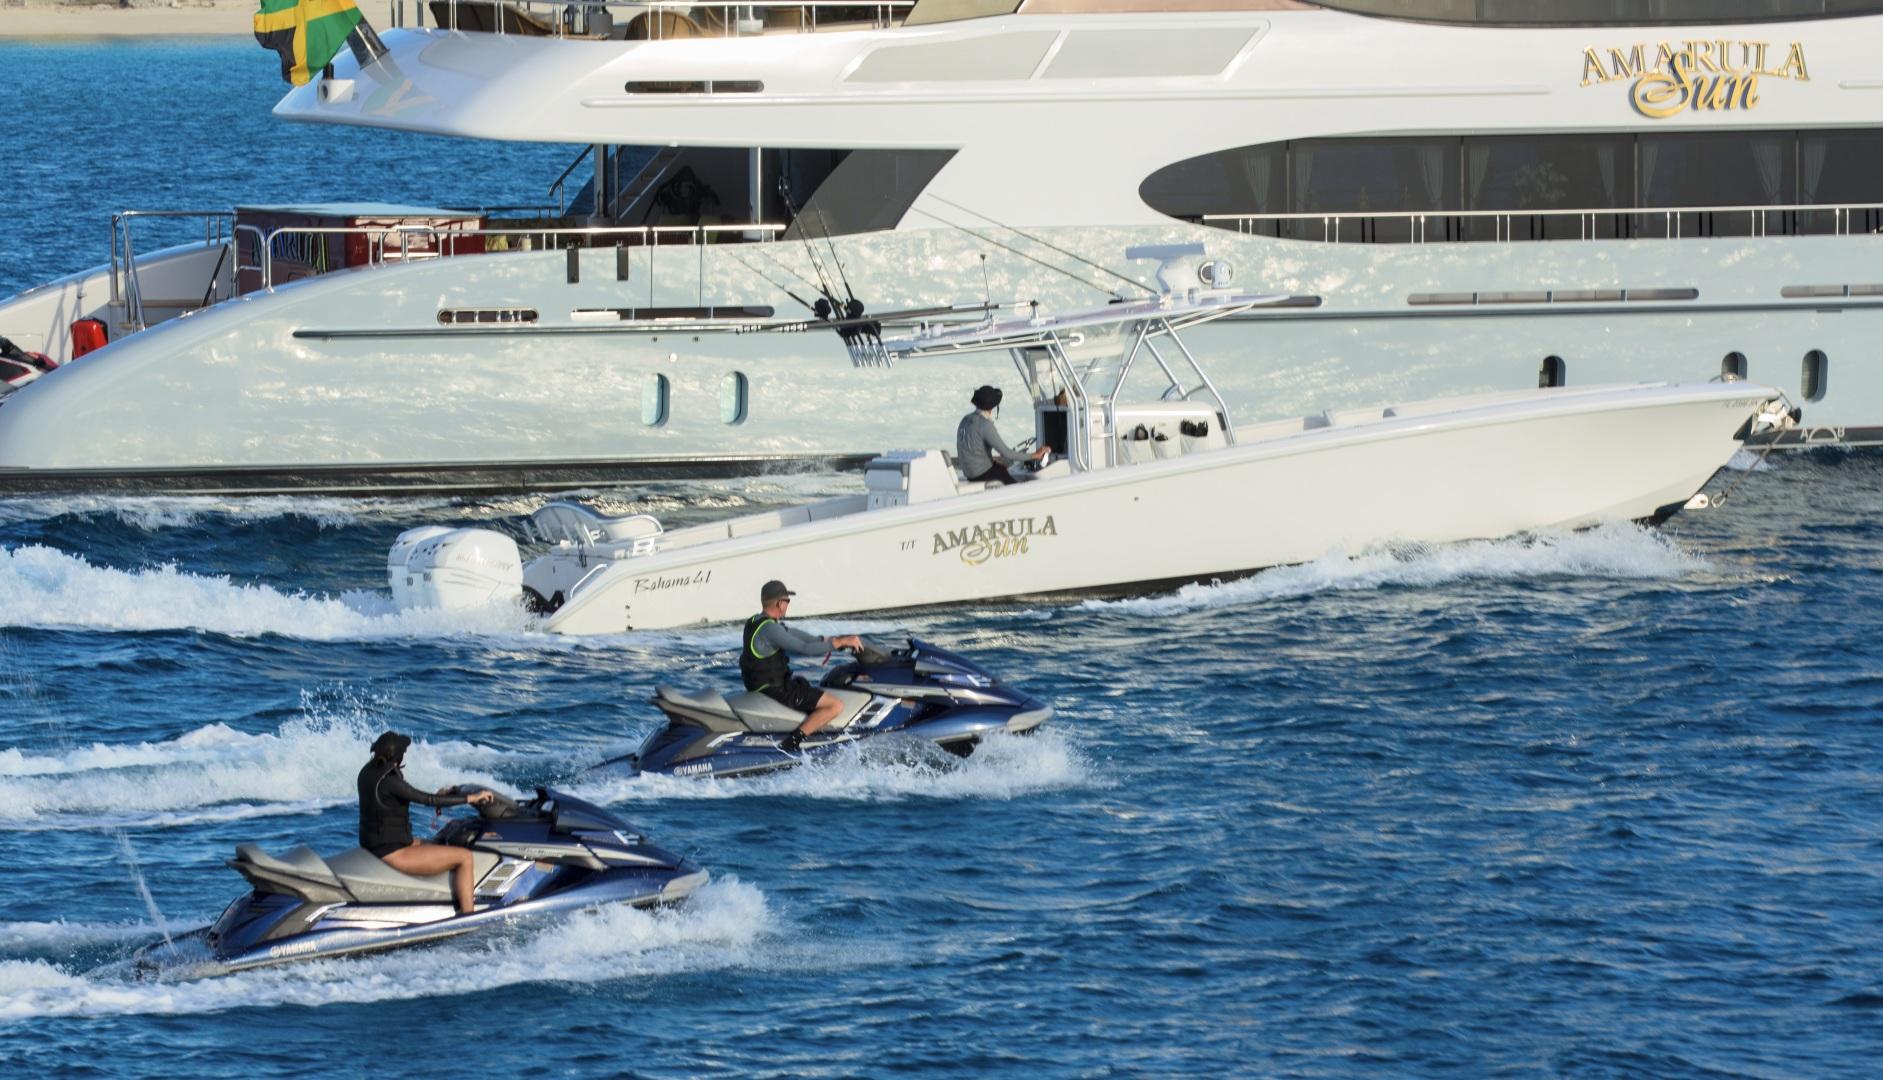 Trinity Yachts-164 Tri-deck Motor Yacht 2008-Amarula Sun Fort Lauderdale-Florida-United States-Water Toys-1514038 | Thumbnail